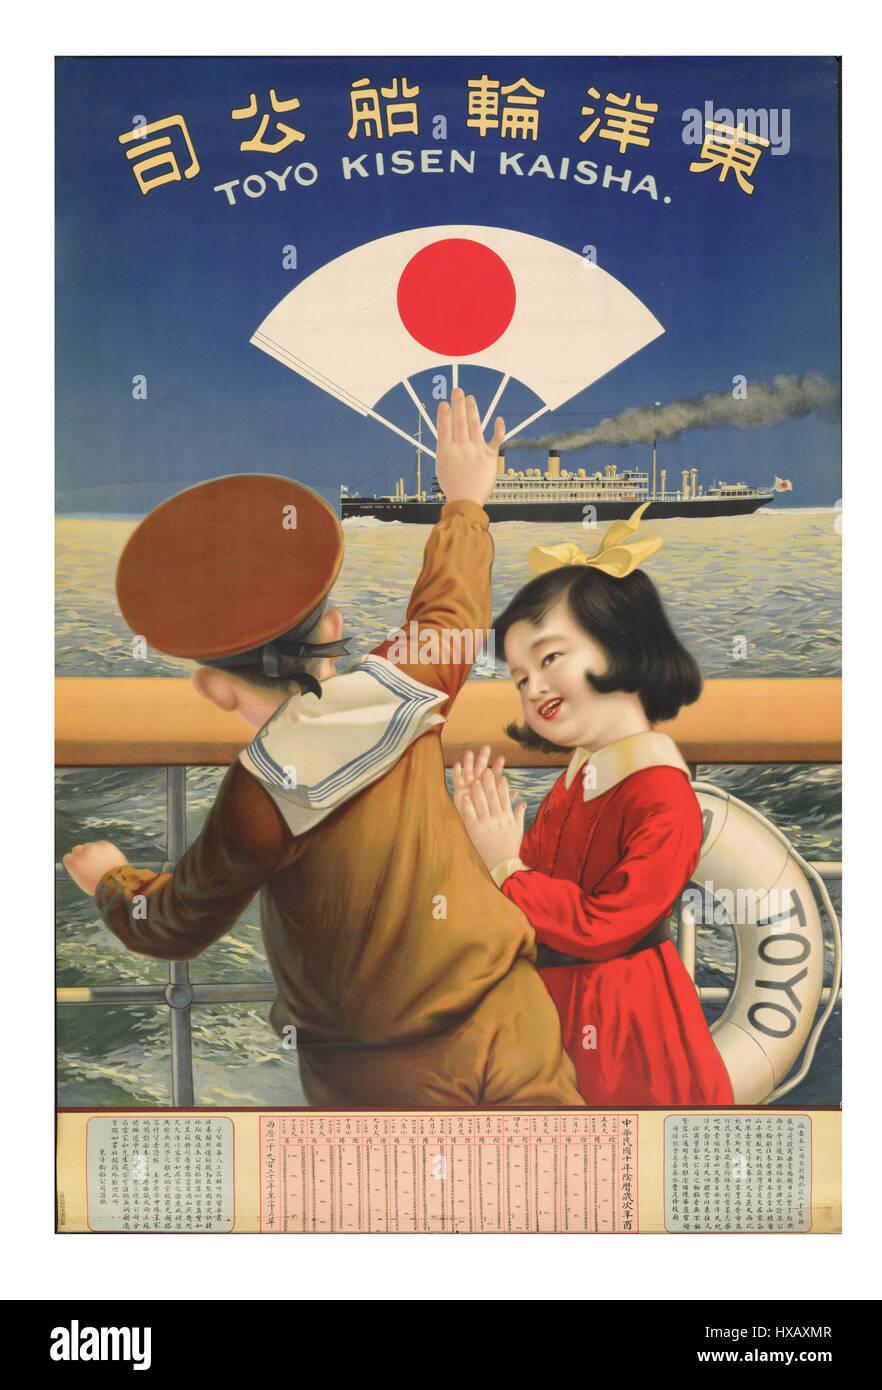 Vintage 1900's early 20th century steamship travel Toyo Kisen Kaisha Japan Steam Ship Postcard/Poster - Stock Image